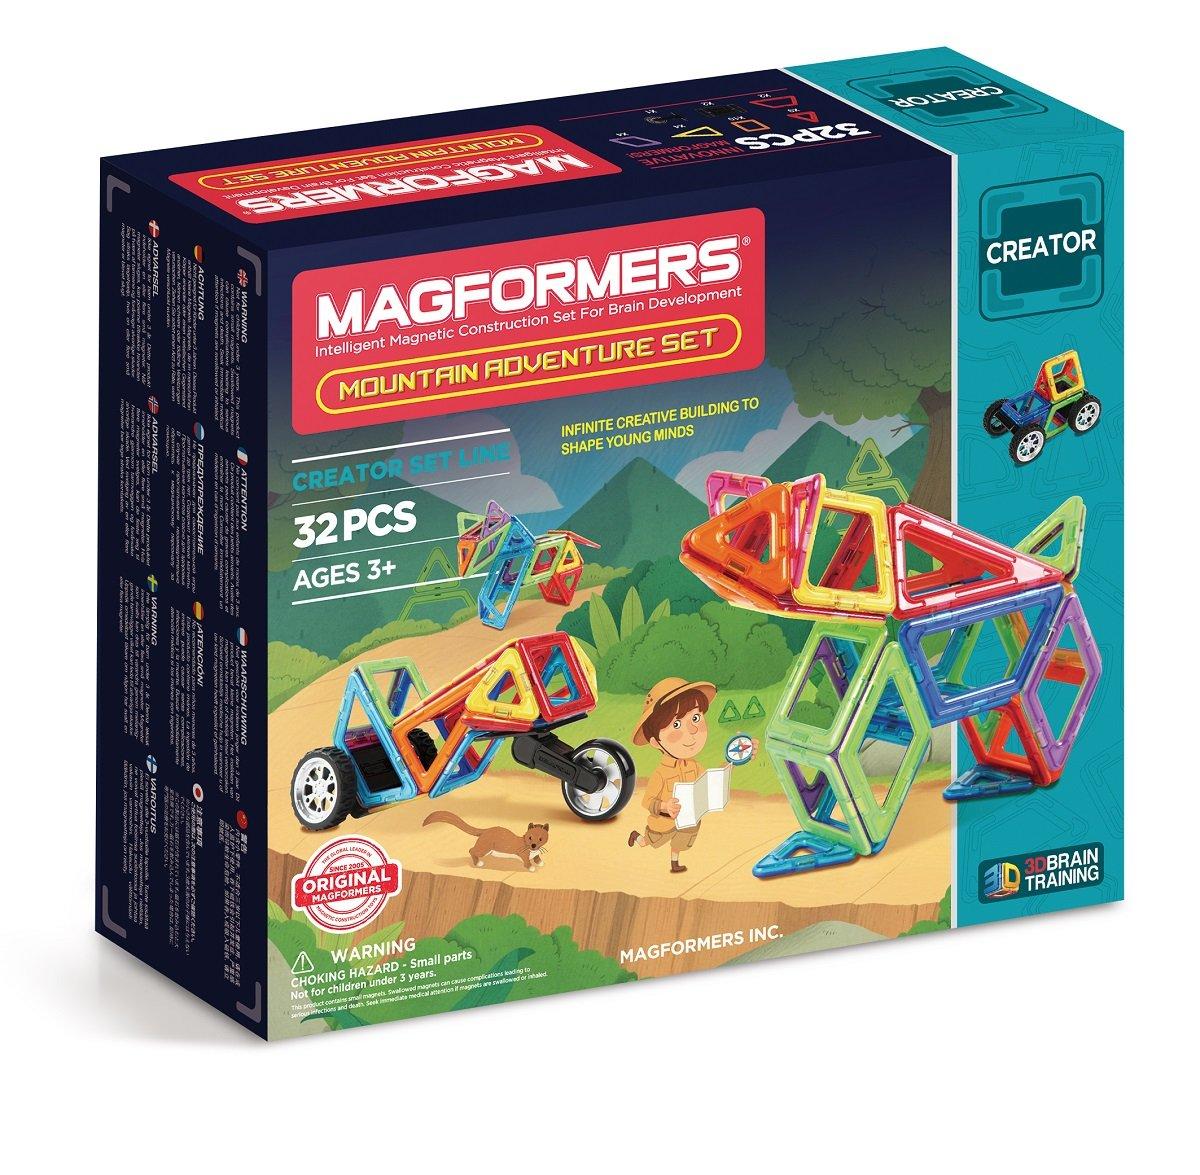 274 – 81 Magformers Mountain Adventure Set